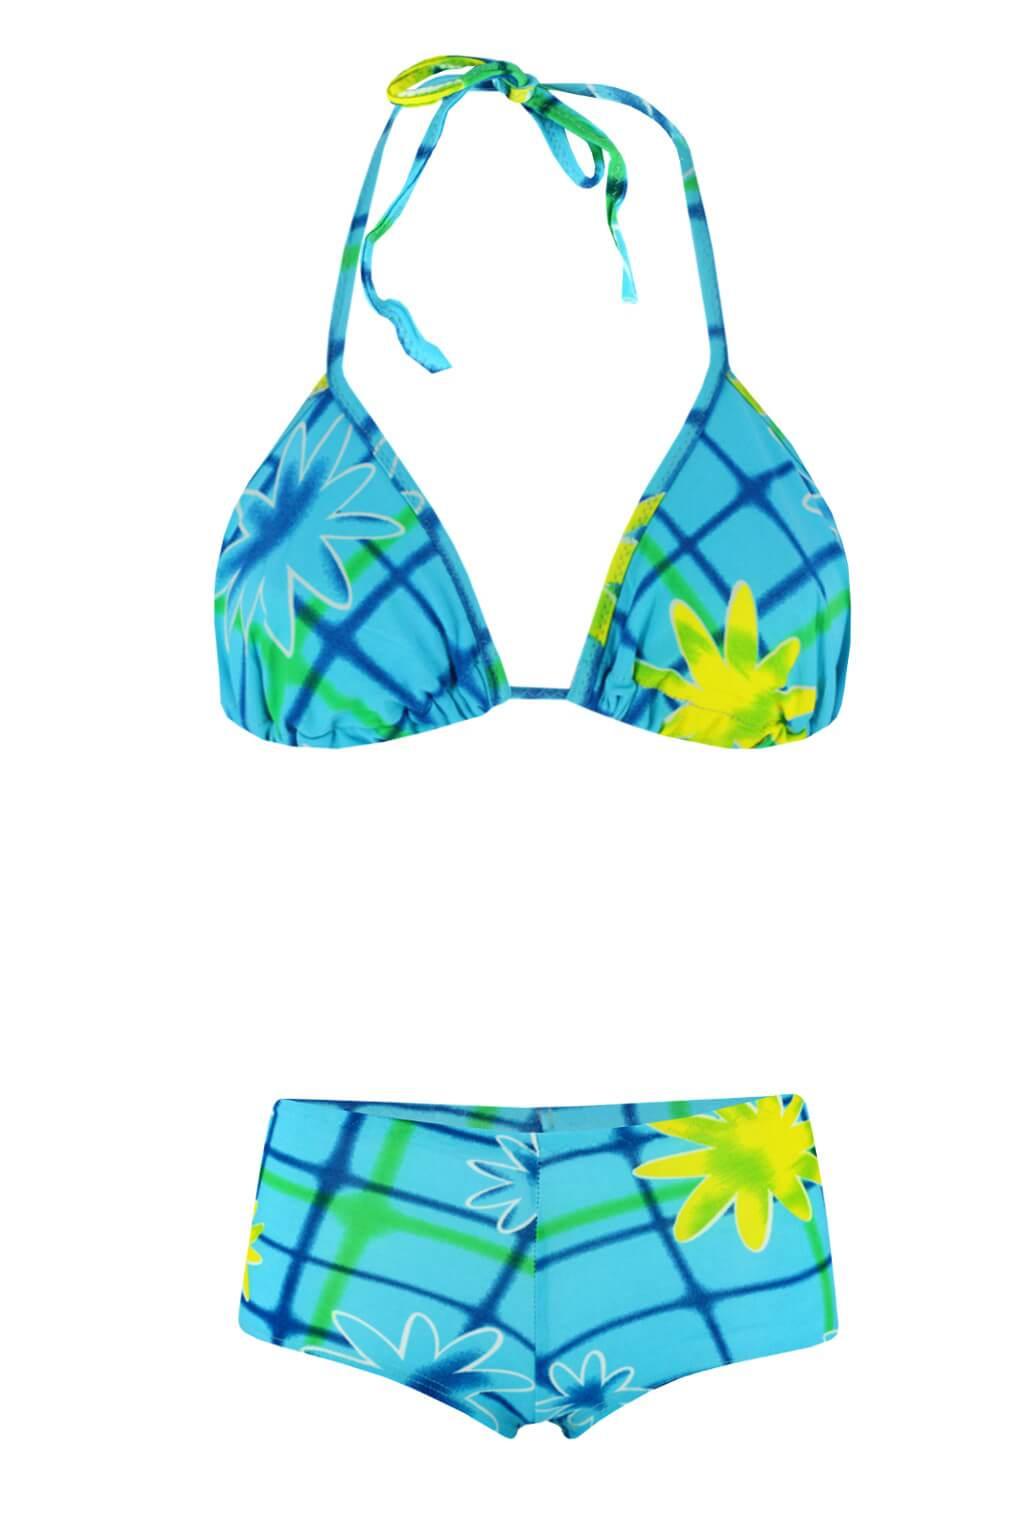 Aqua B plavky se sukénkou M modrá